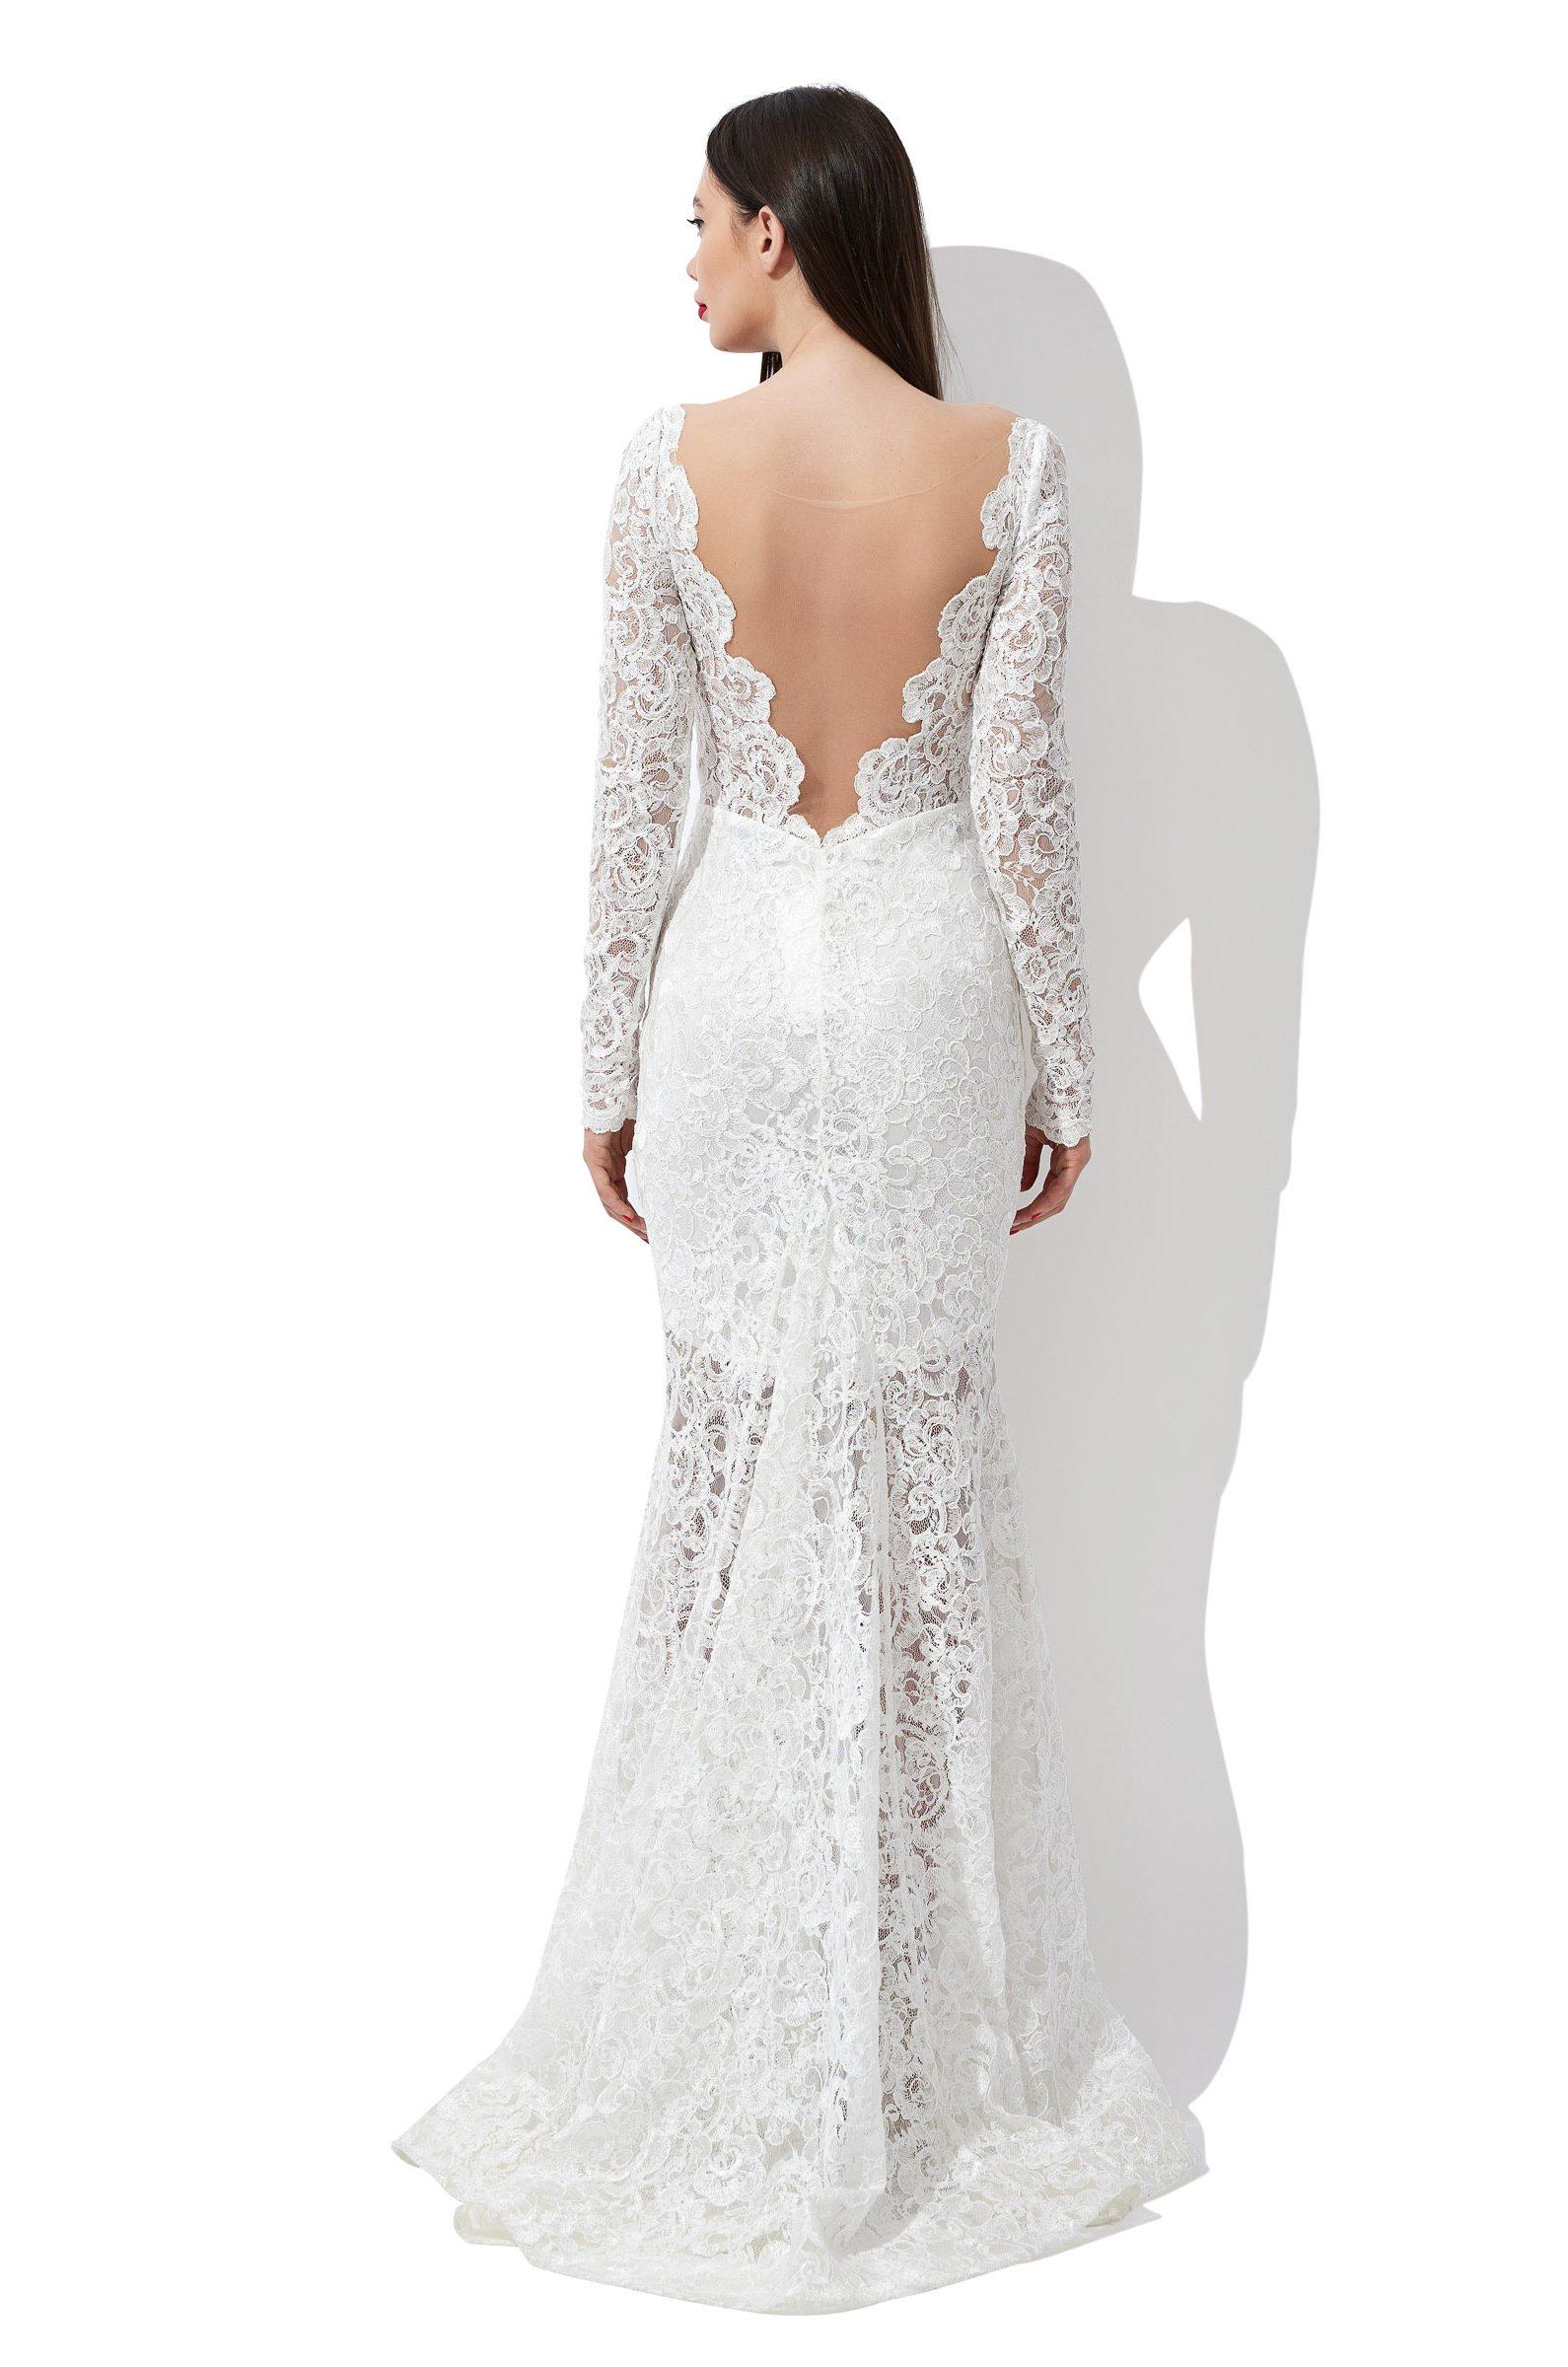 Floral lace mermaid bridal